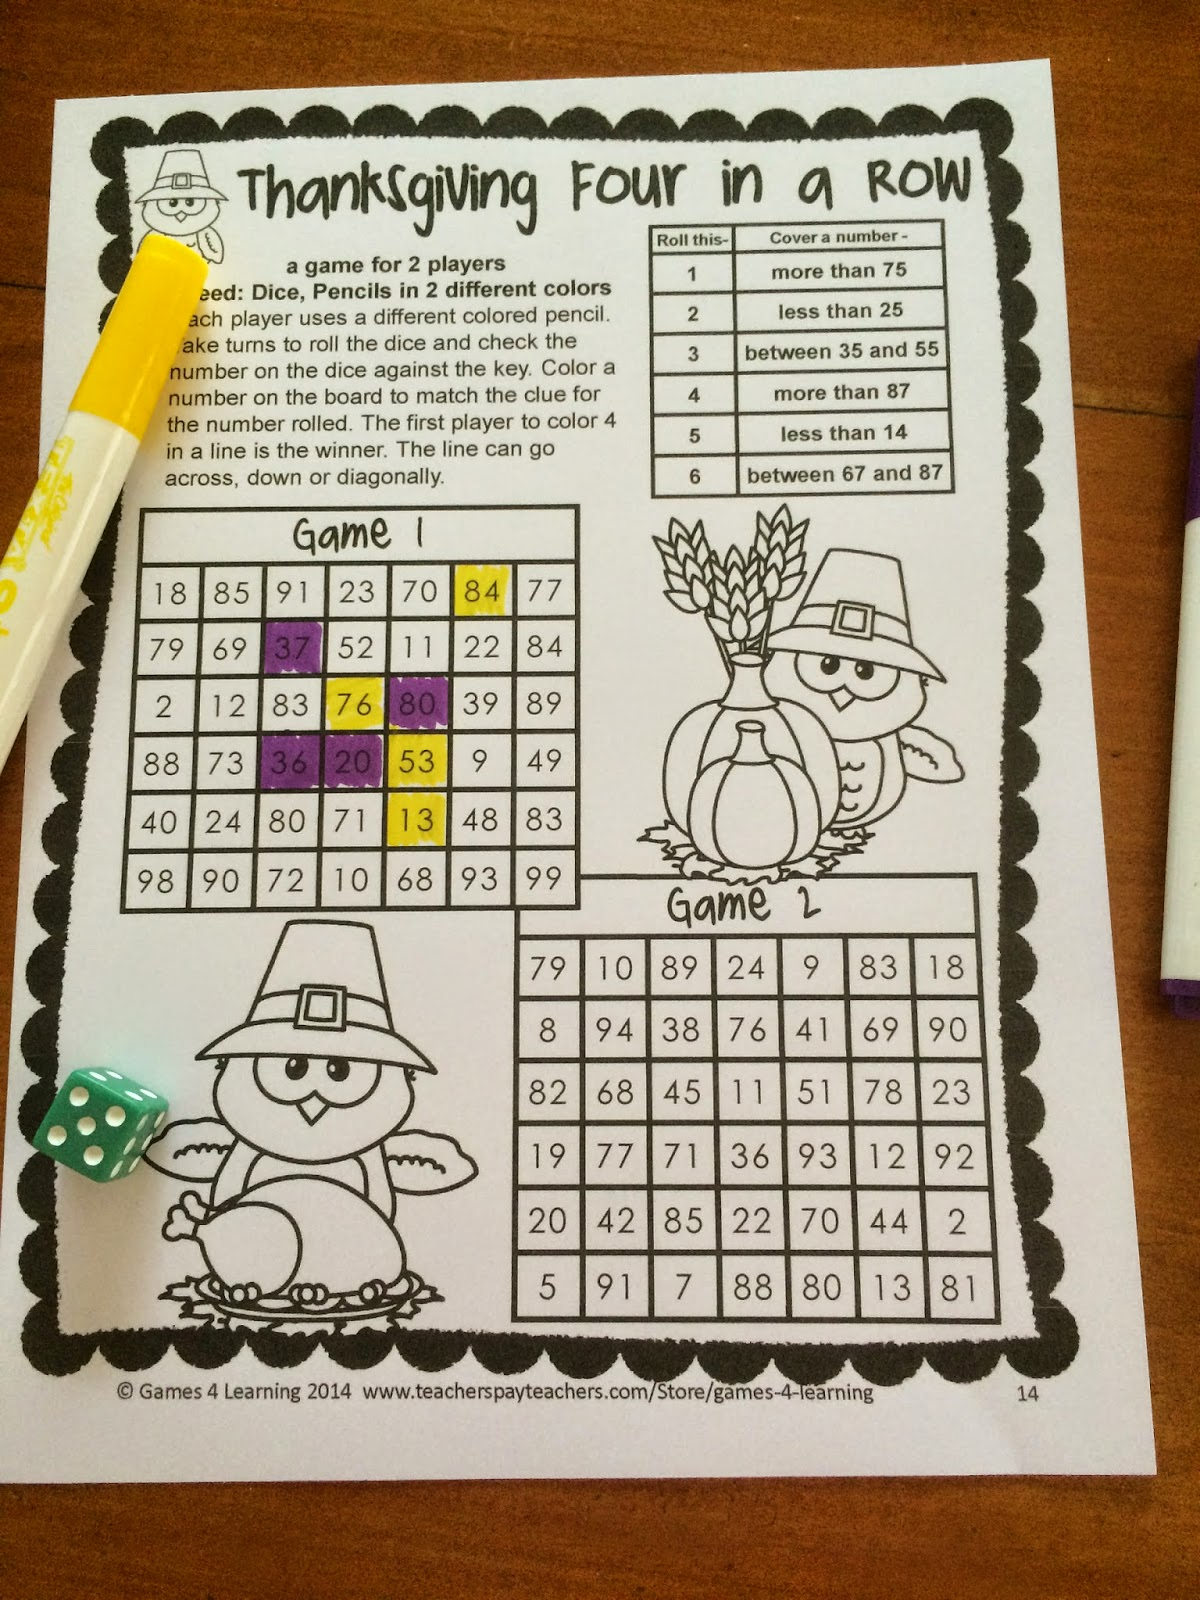 Fun Games 4 Learning Thanksgiving Math Games